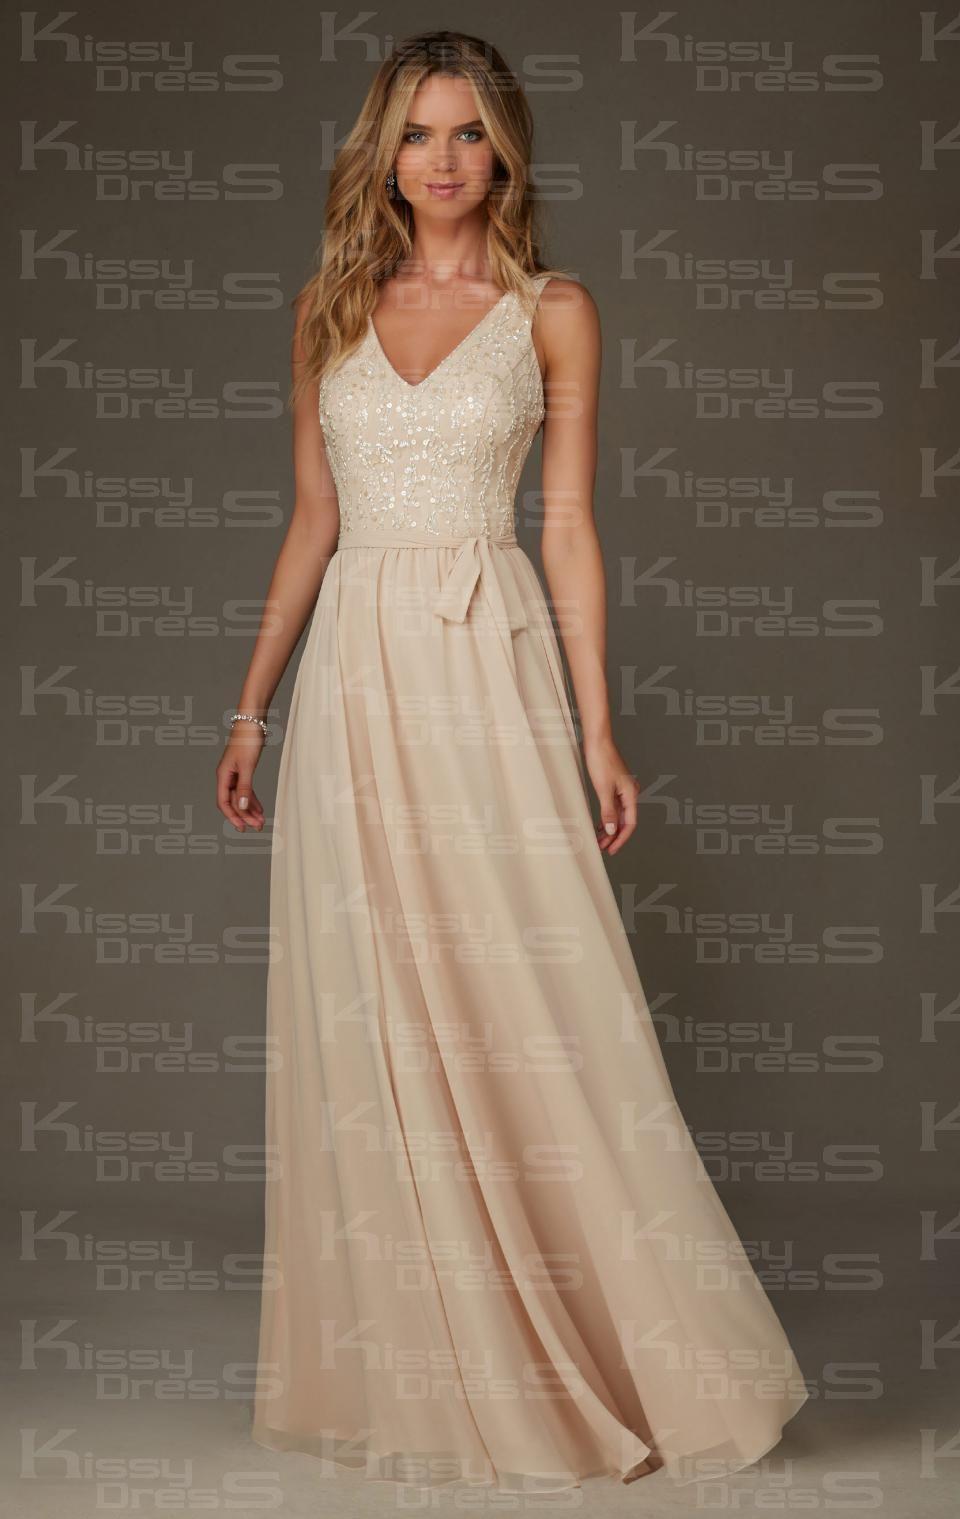 Kissybridesmaidscute champagne long bridesmaid dress kissybridesmaidscute champagne long bridesmaid dress bnncl0014 ombrellifo Images